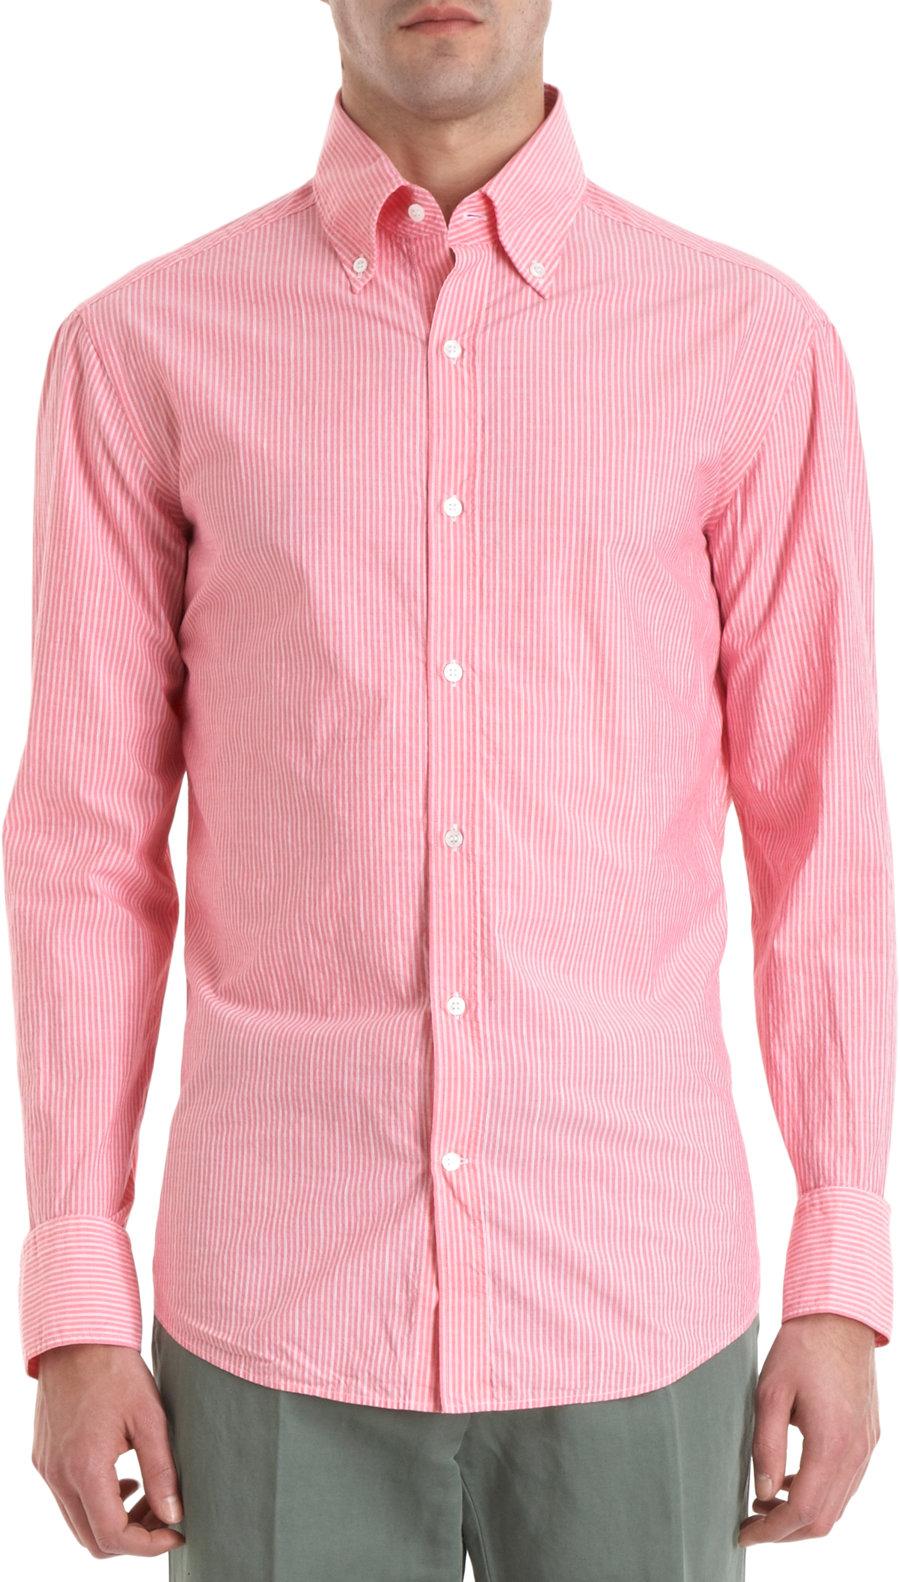 Michael bastian striped button down collar shirt in pink for Striped button down shirts for men